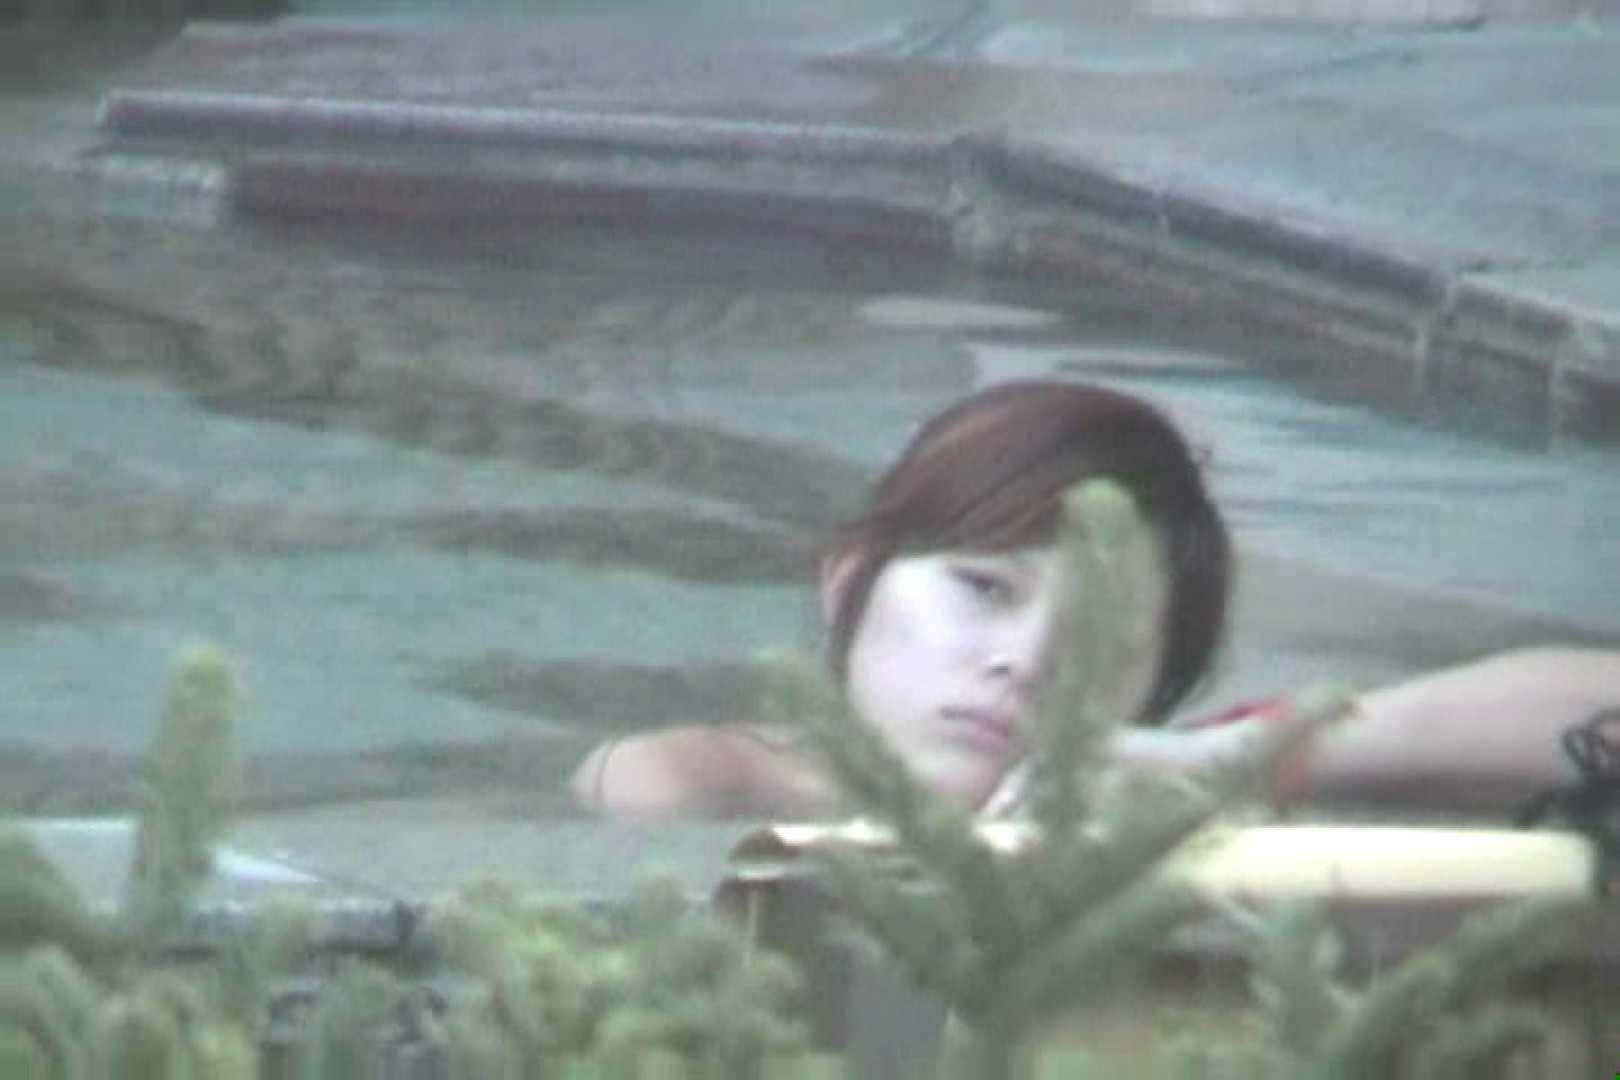 Aquaな露天風呂Vol.609 盗撮シリーズ   露天風呂編  107PIX 59